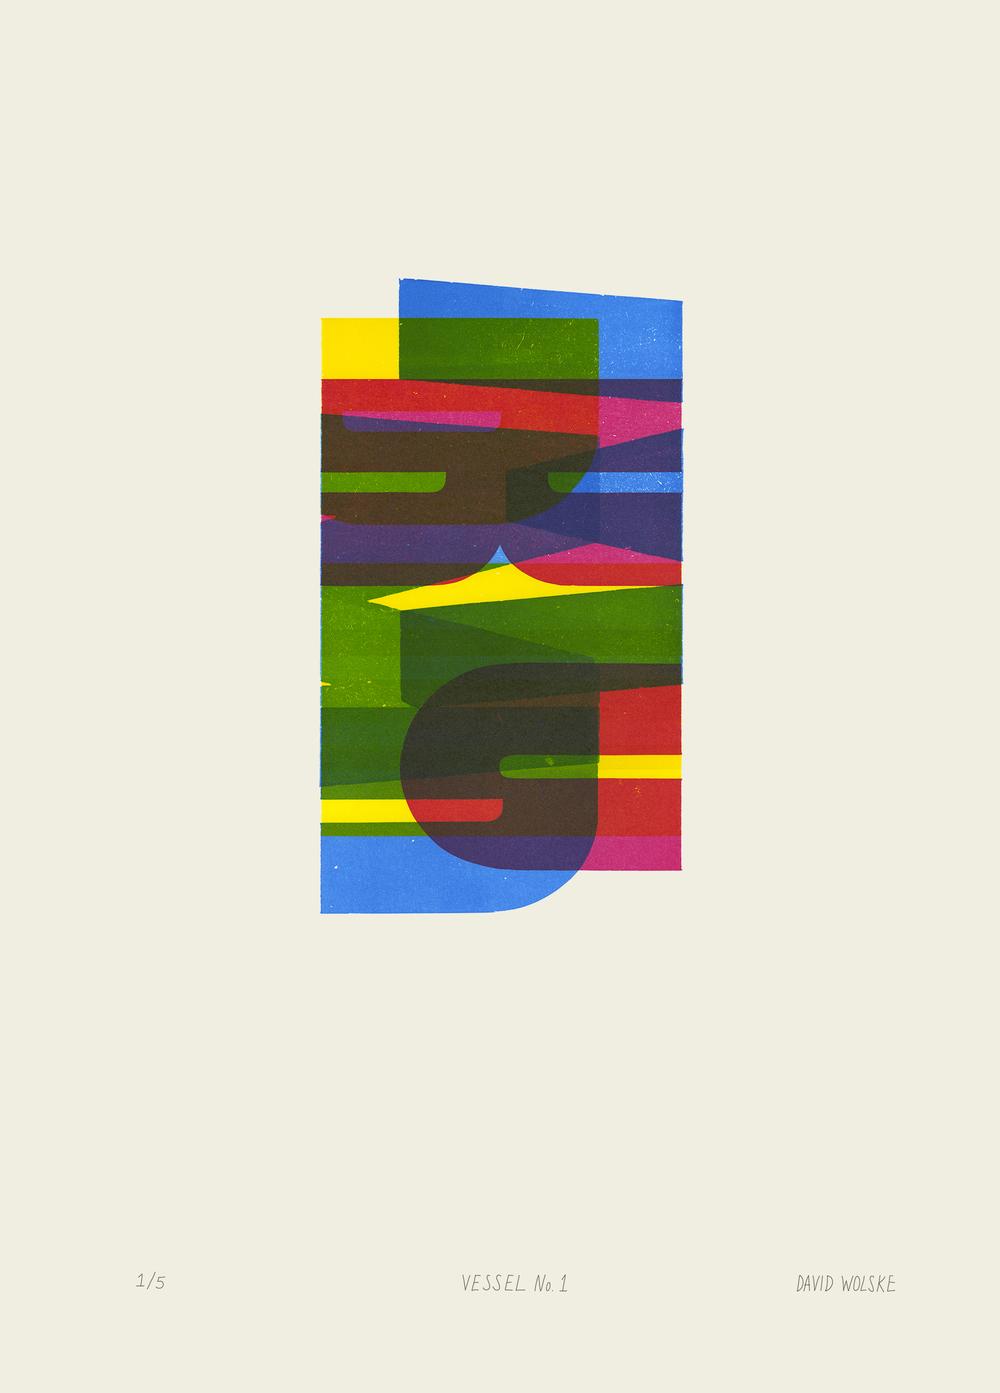 Vessel No. 1 by David Wolske